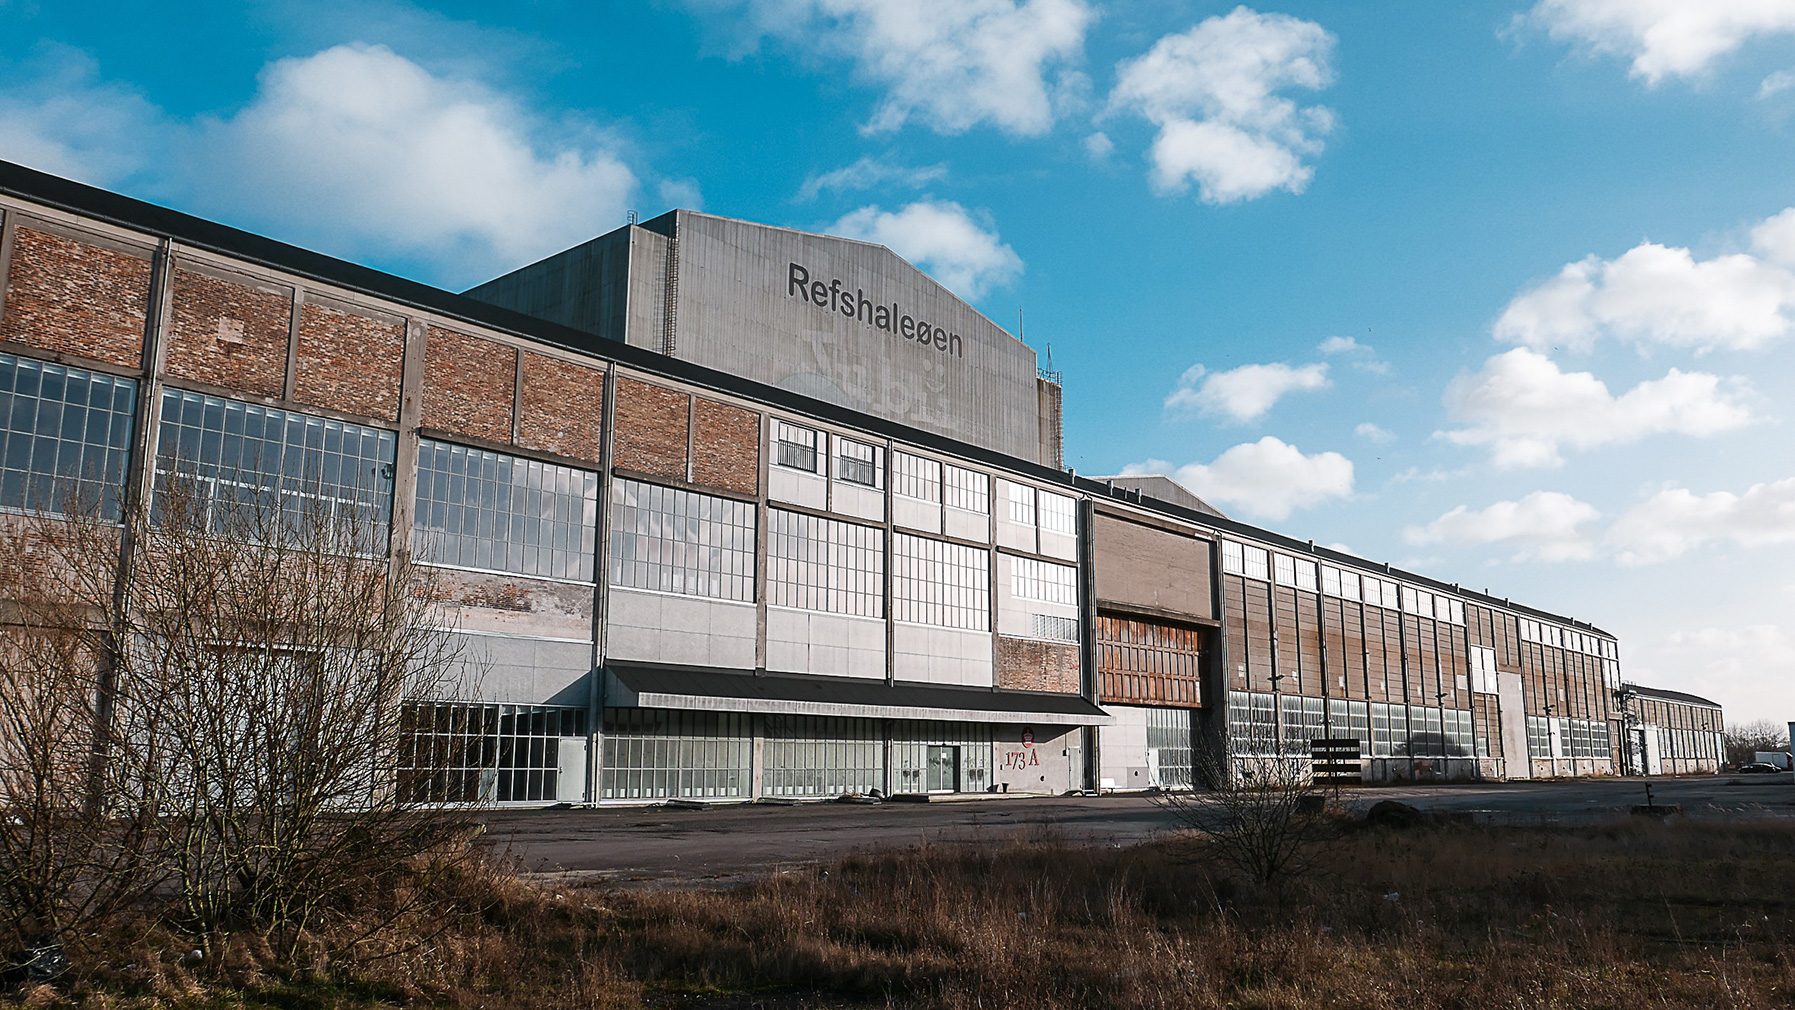 B&W's old welding hall and the framework of the new art centre Copenhagen Contemporary, 2018. Photography: Katrine Jungersen Hansen